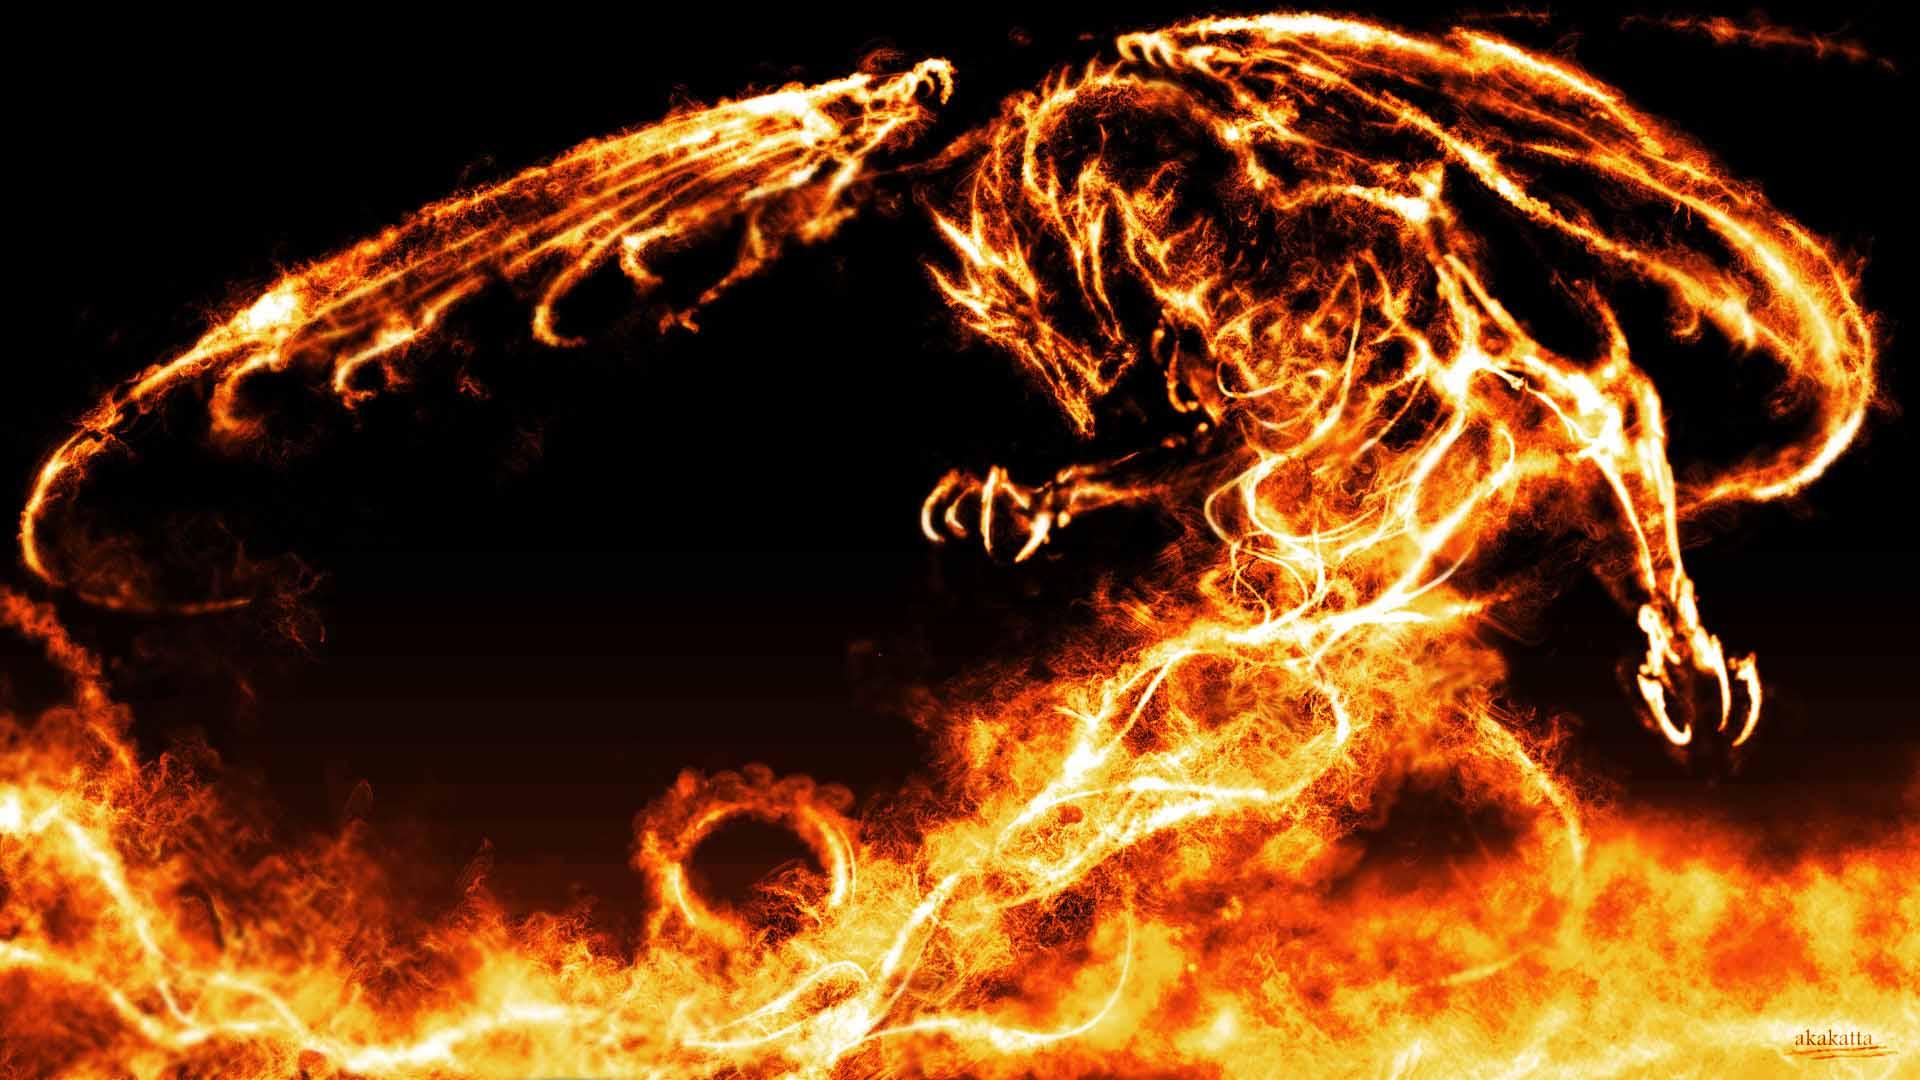 Hd wallpaper dragon - Dragon Wallpaper Hd Viewing Gallery